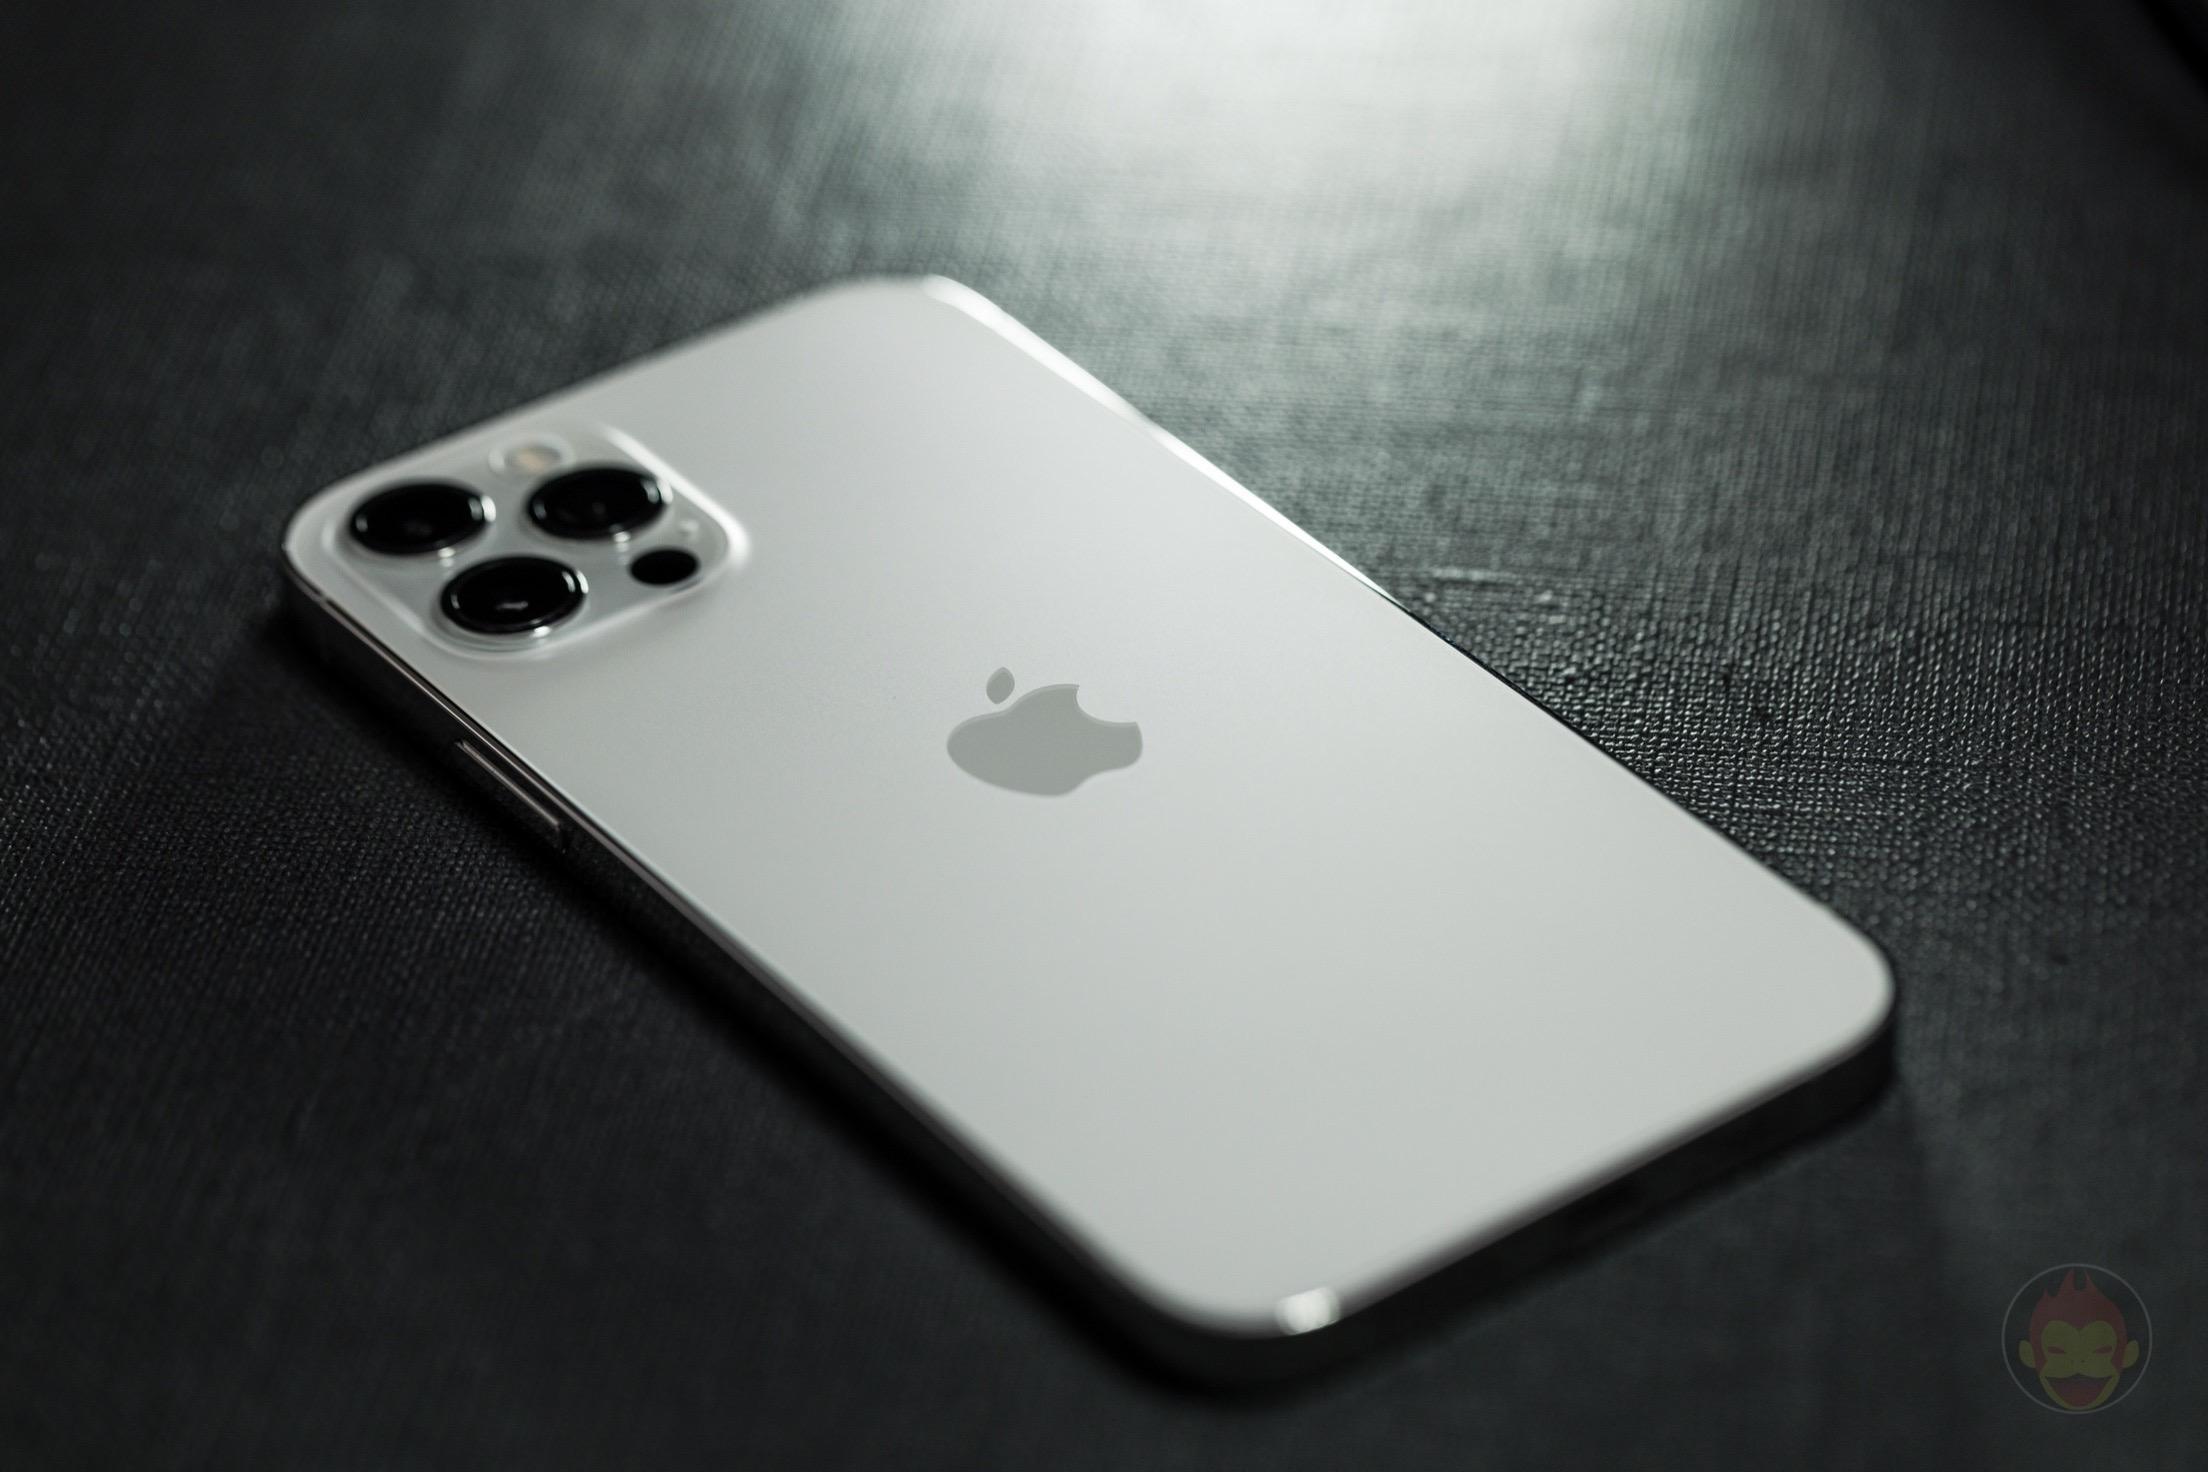 iPhone 12 Proのデザイン